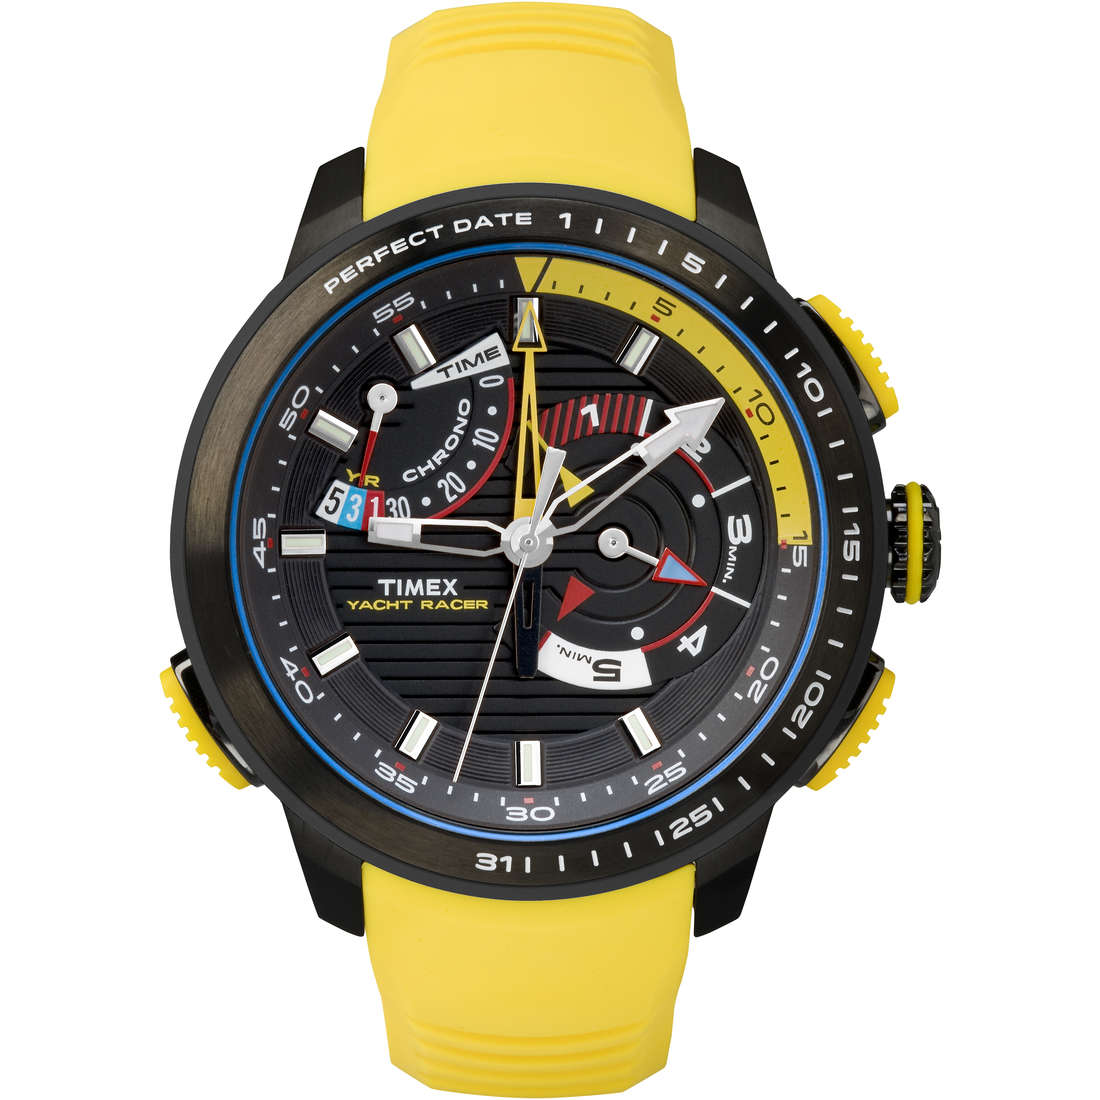 orologio multifunzione uomo Timex Iq Yatch Racer TW2P44500